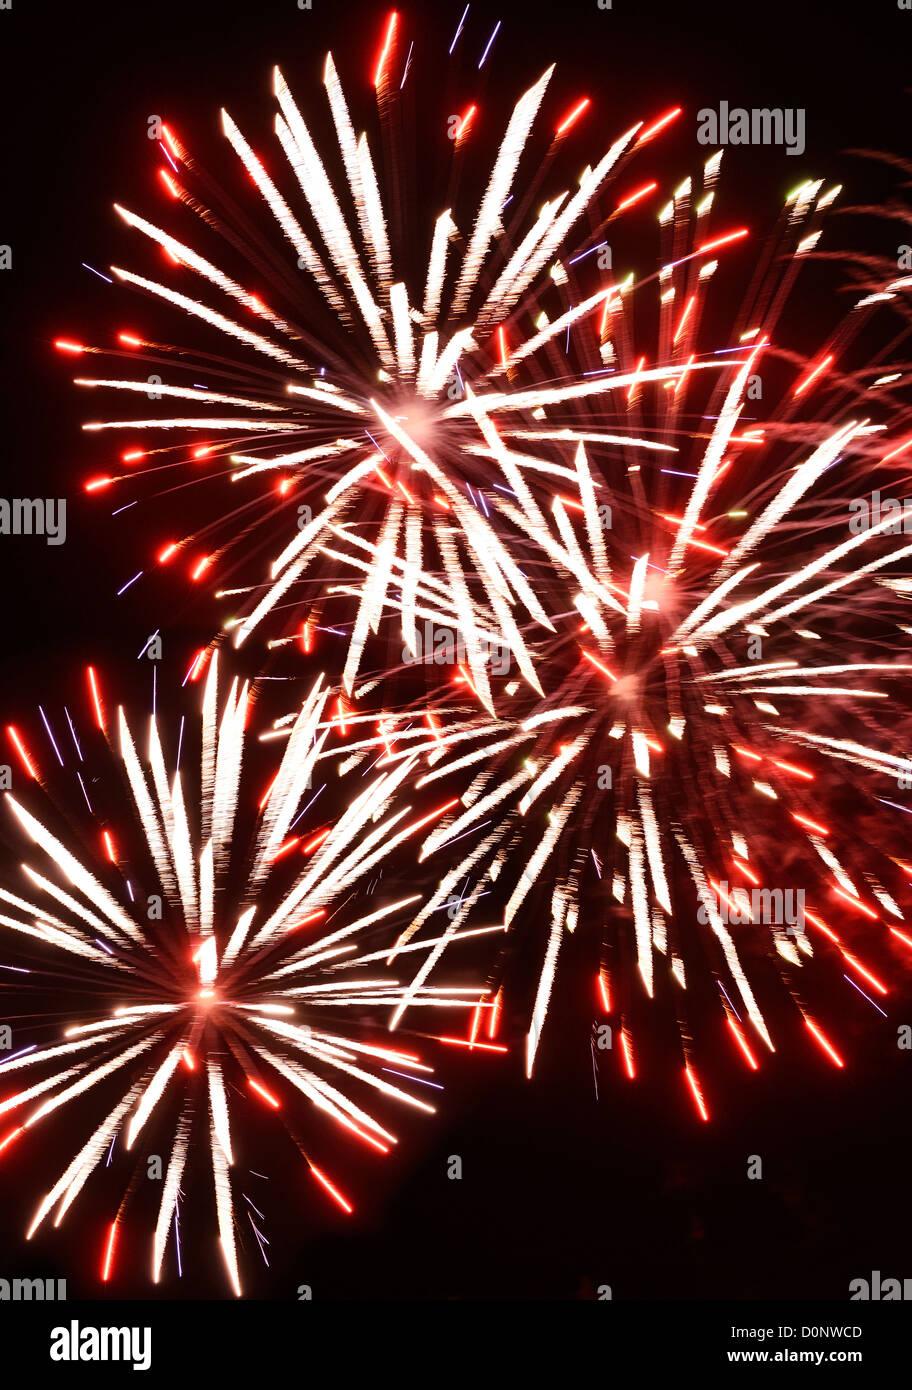 Firework explosion - Stock Image